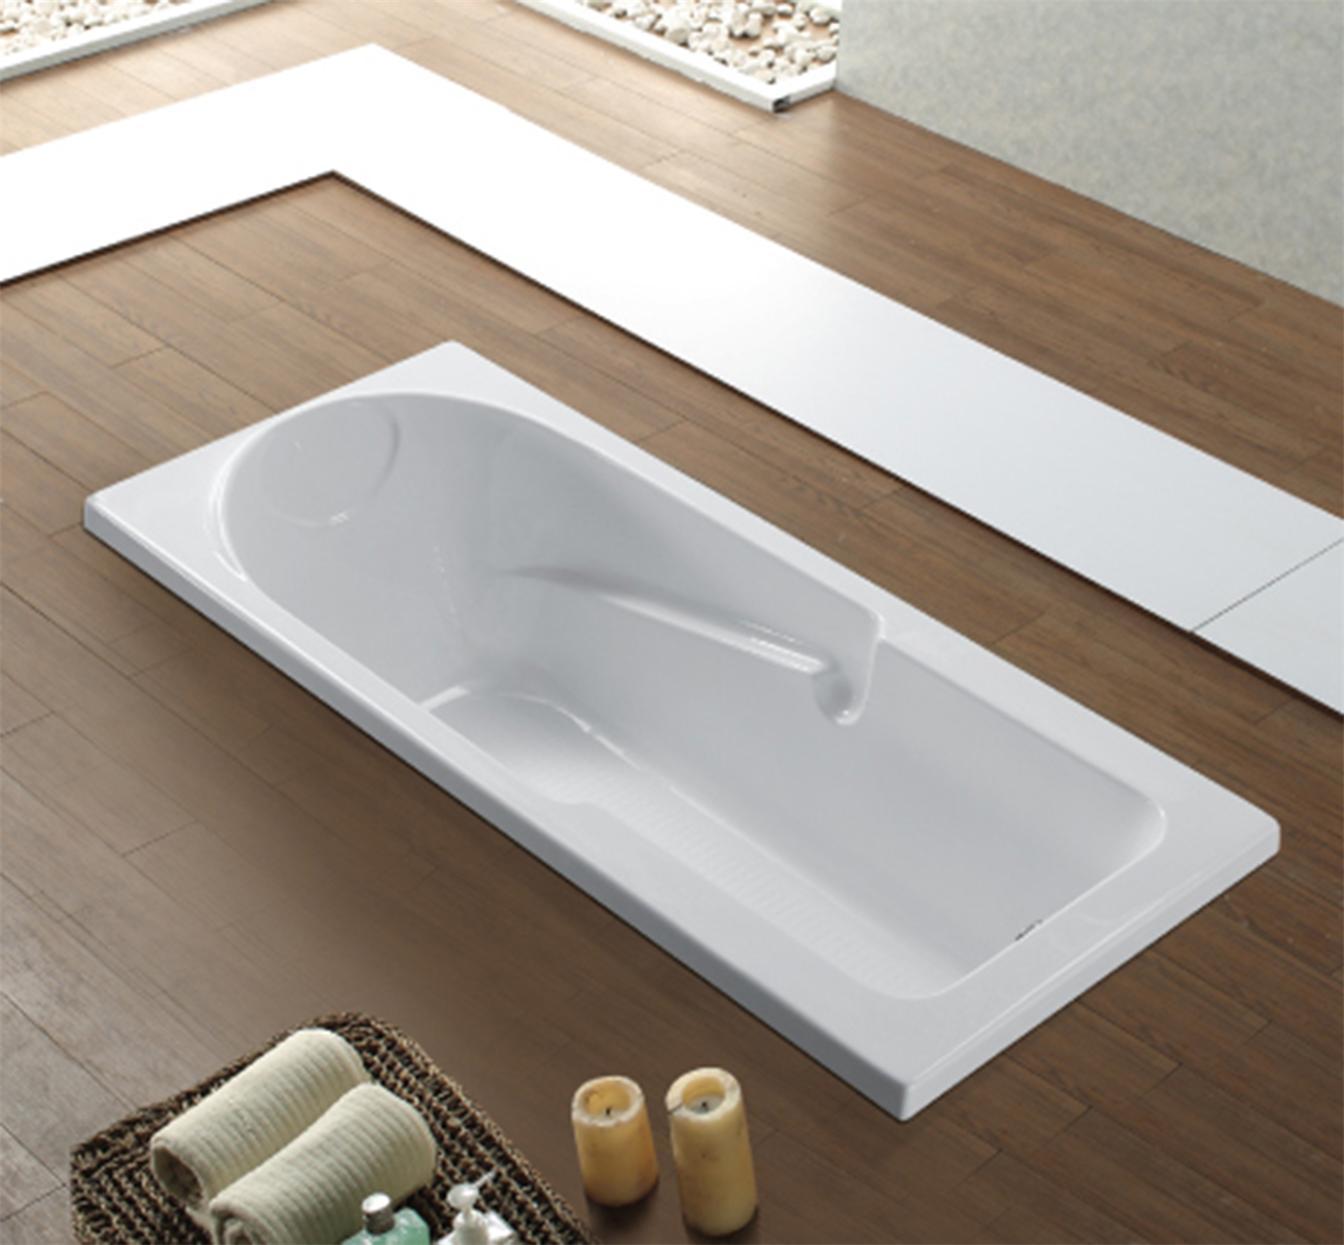 China Cheap Acrylic Rectangle Drop-in Bathtub B-615 - China Bathtub ...